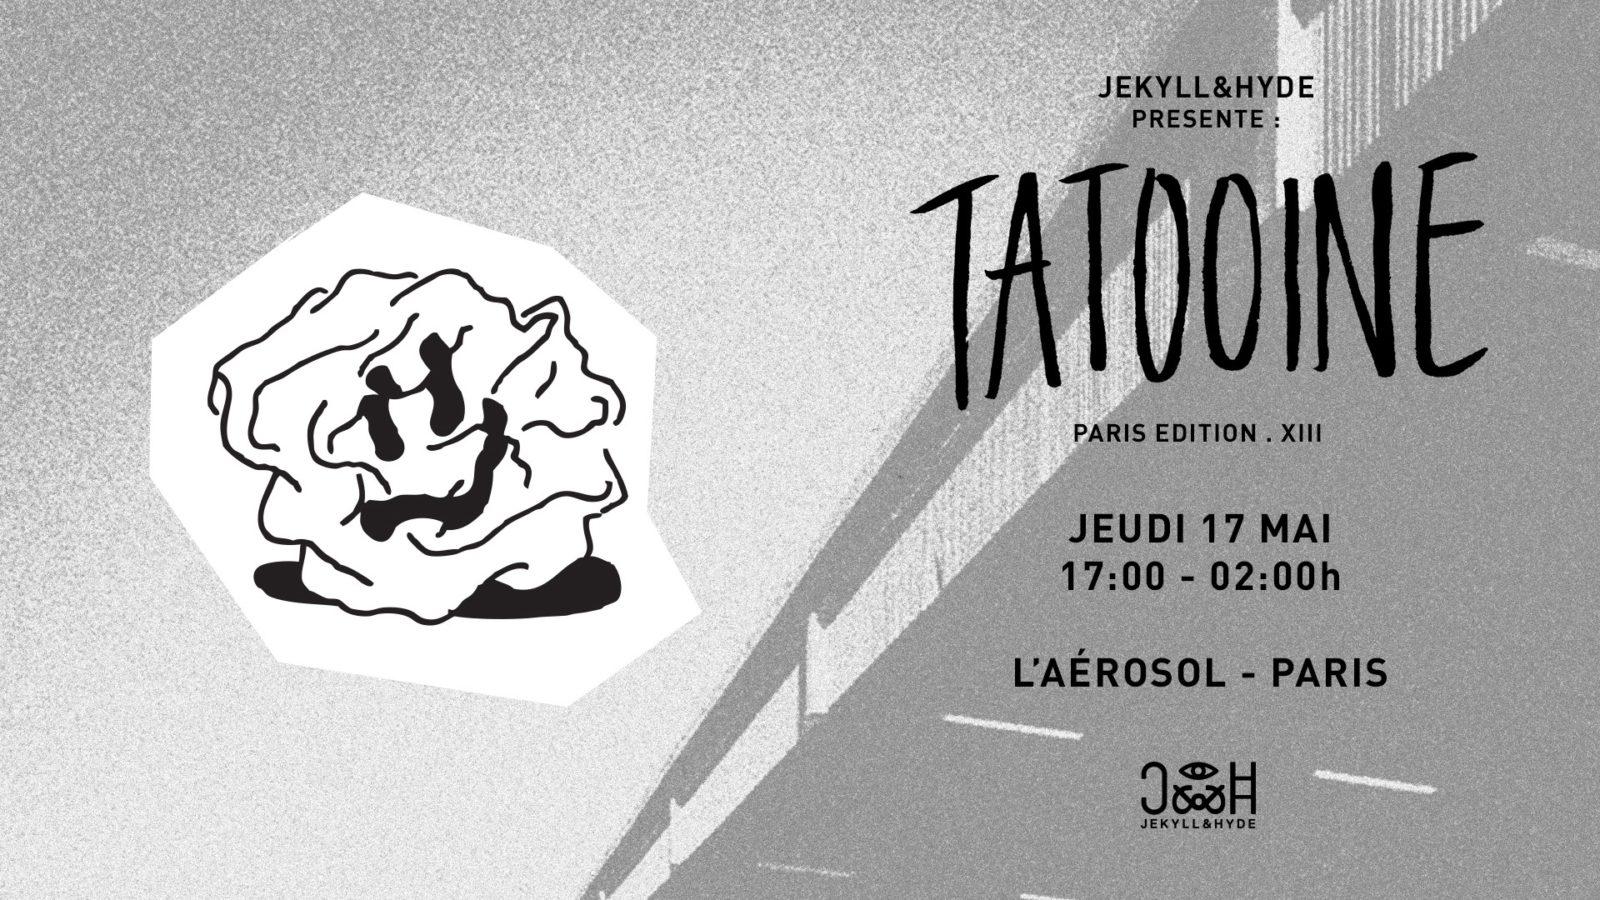 [Évènement] Tatooine XIII @ L'Aérosol